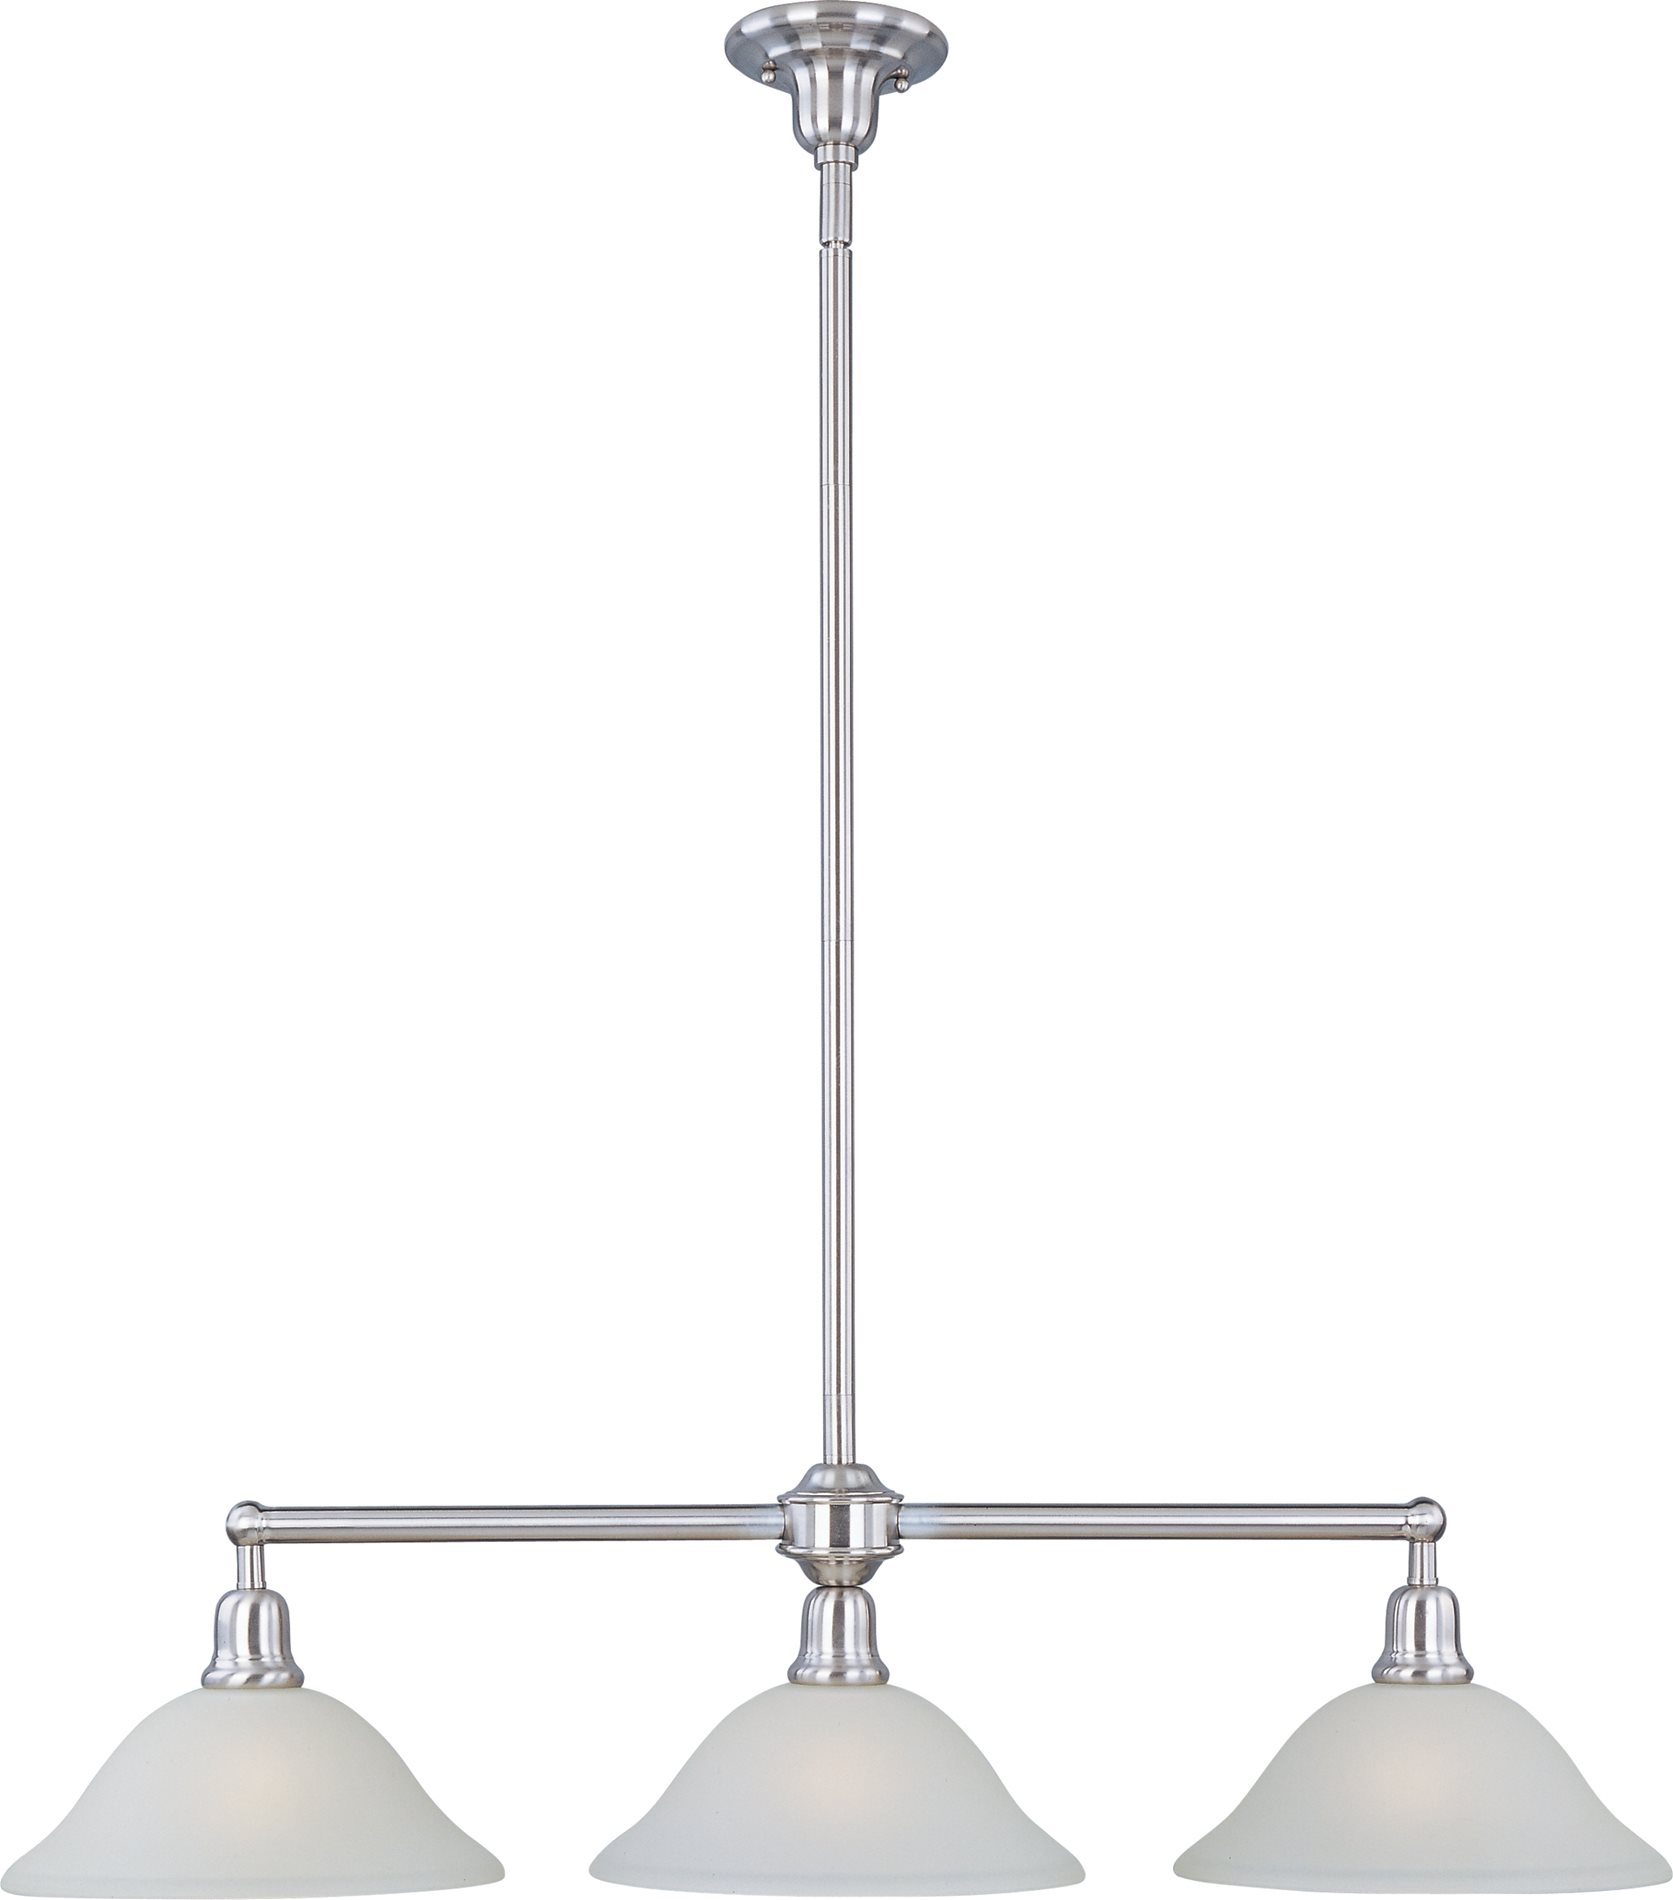 kitchen island lighting fixtures aprons maxim 11093svsn bel air transitional